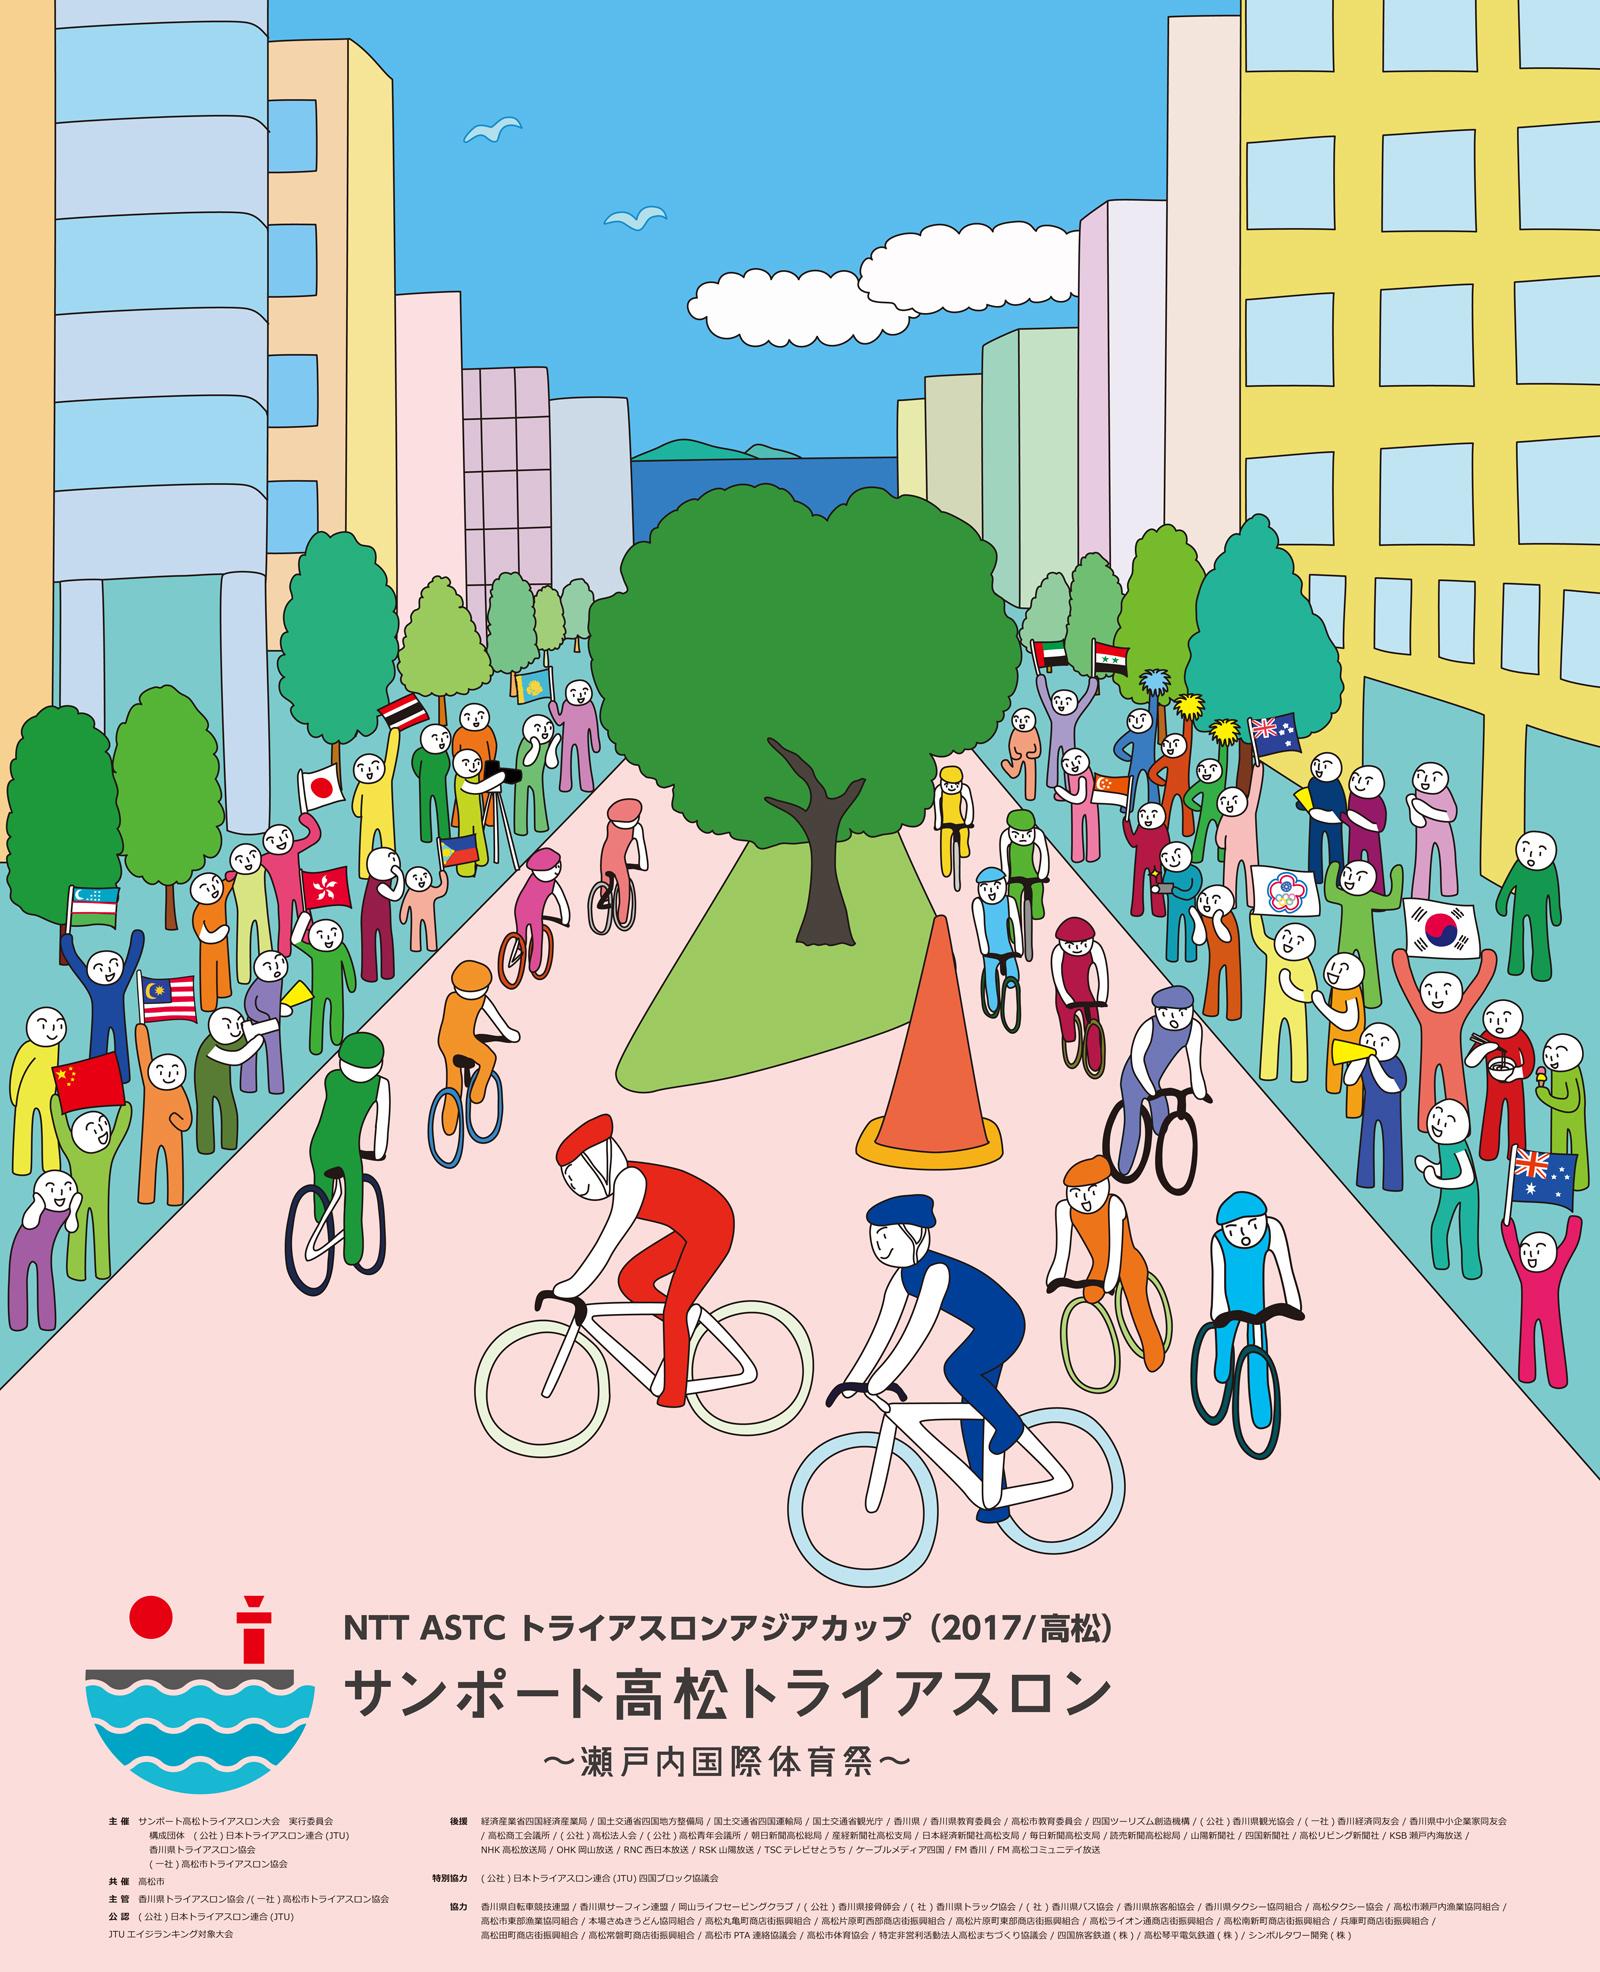 takamatsu_poster_2018_1600